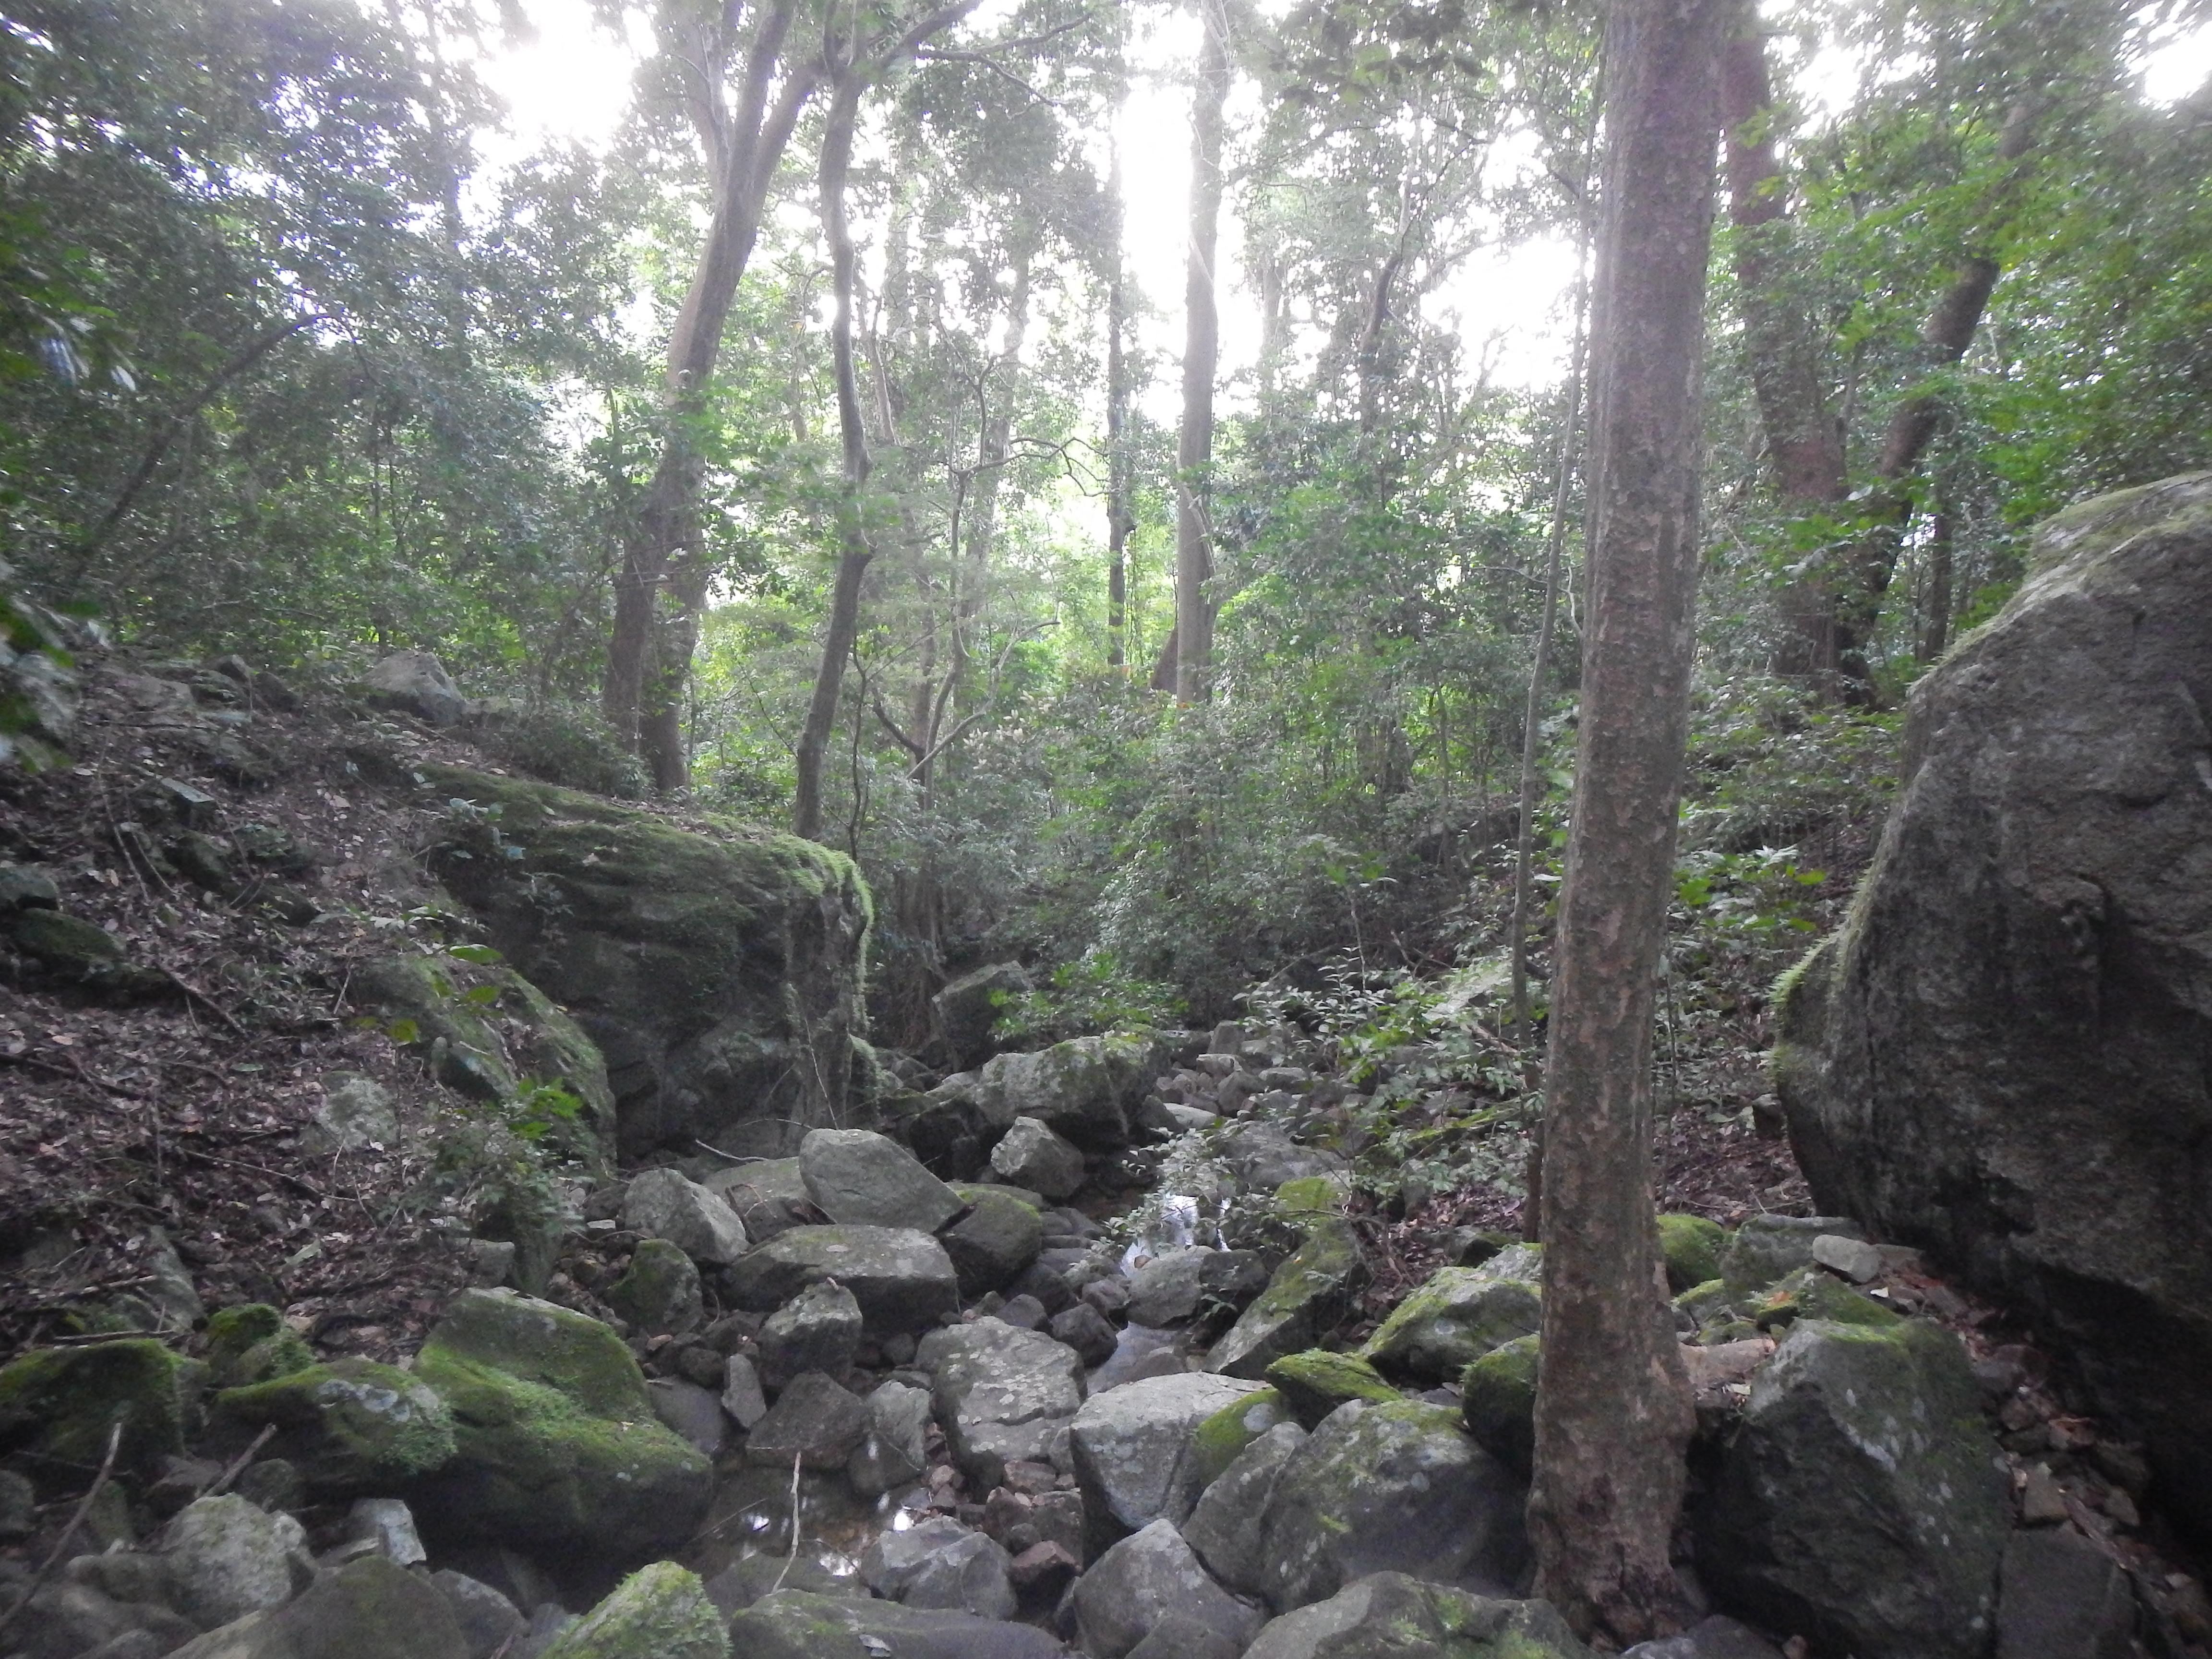 Kounounkan forest near Samayah (Photo: © Xander van der Burgt, RBG Kew)